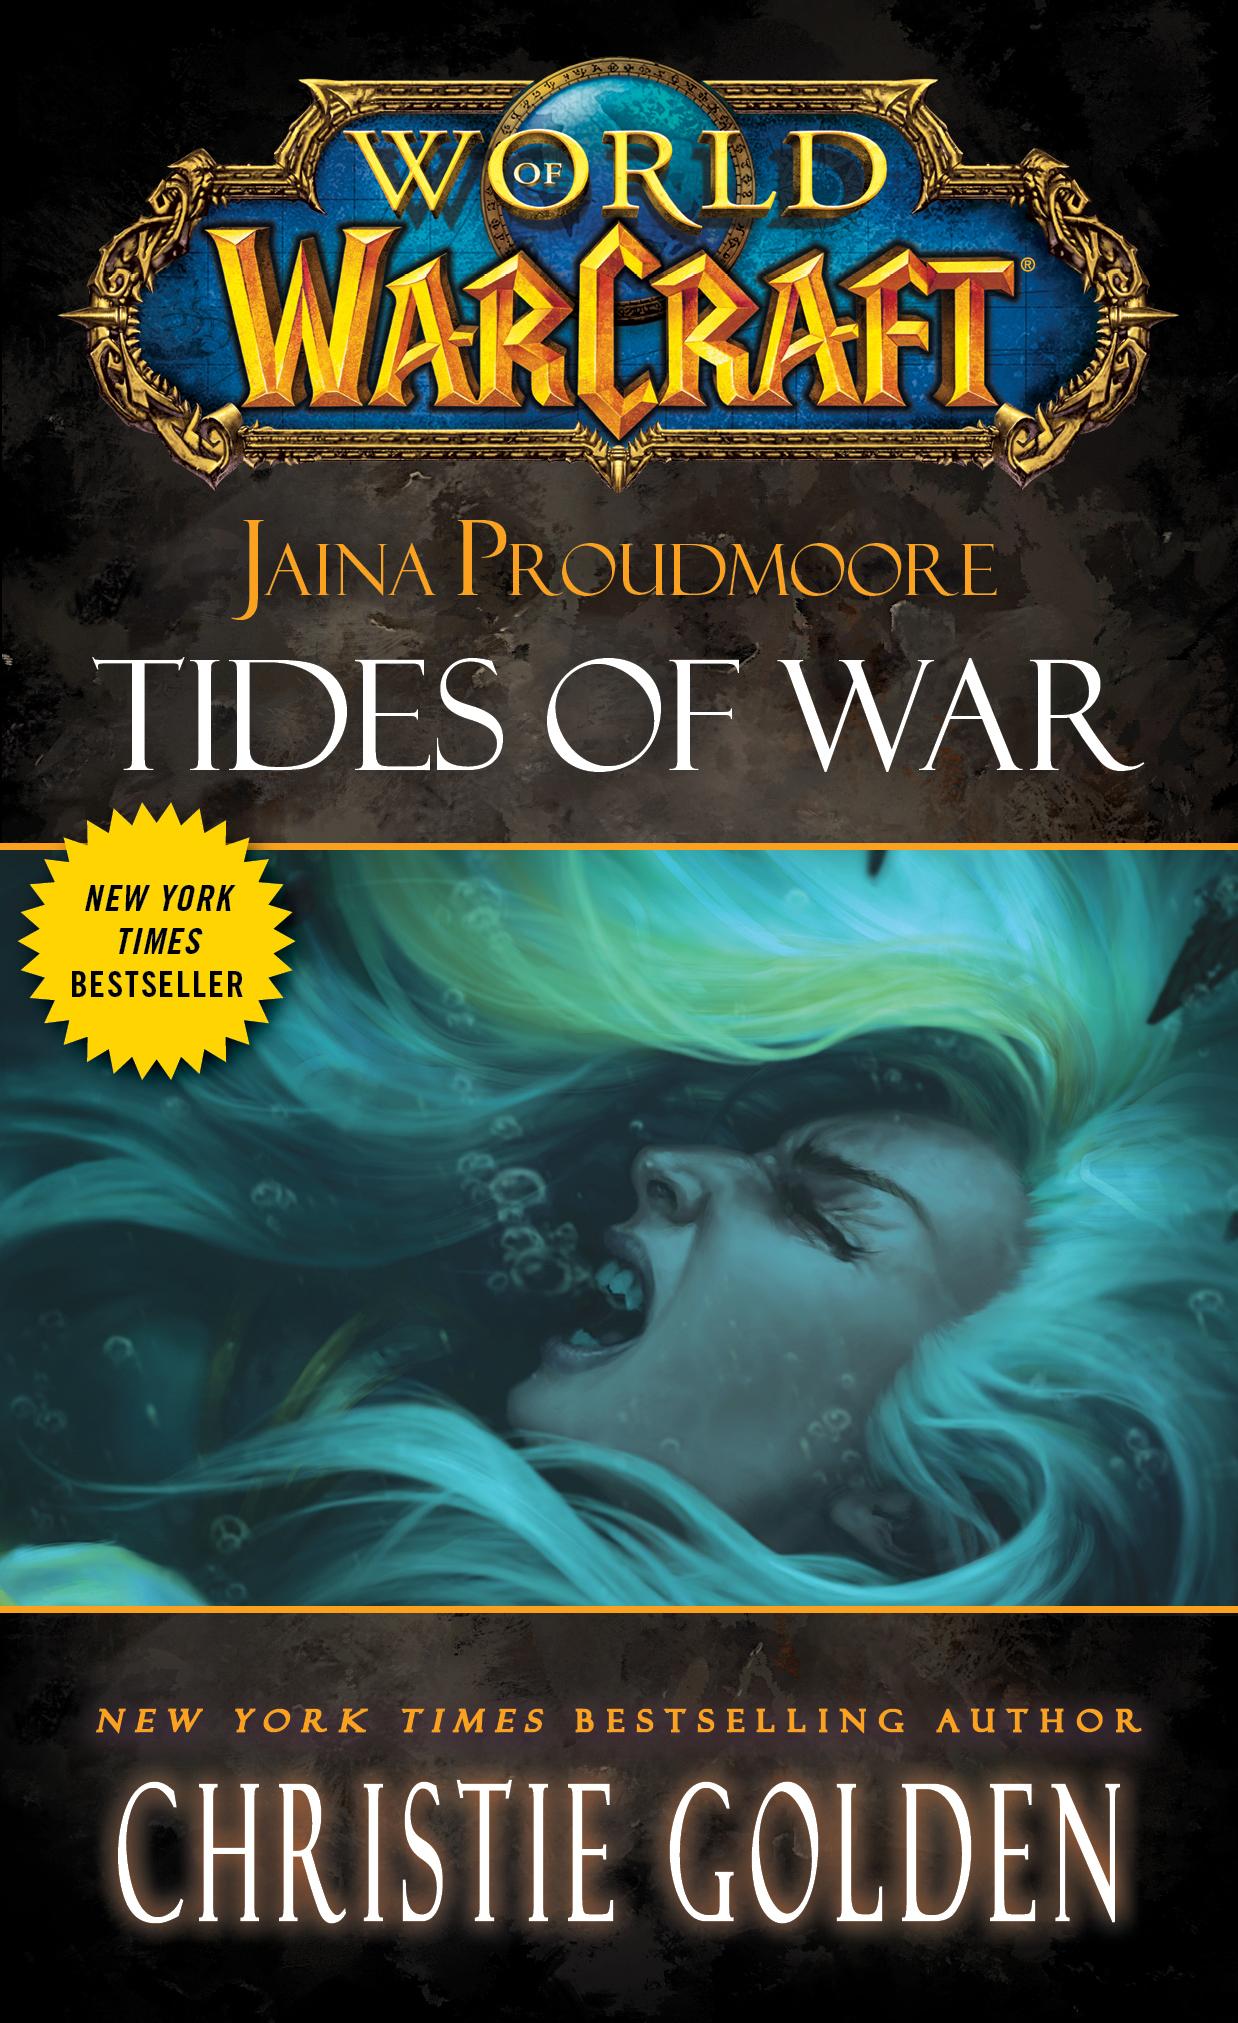 World of Warcraft: Jaina Proudmoore: Tides of War | Book